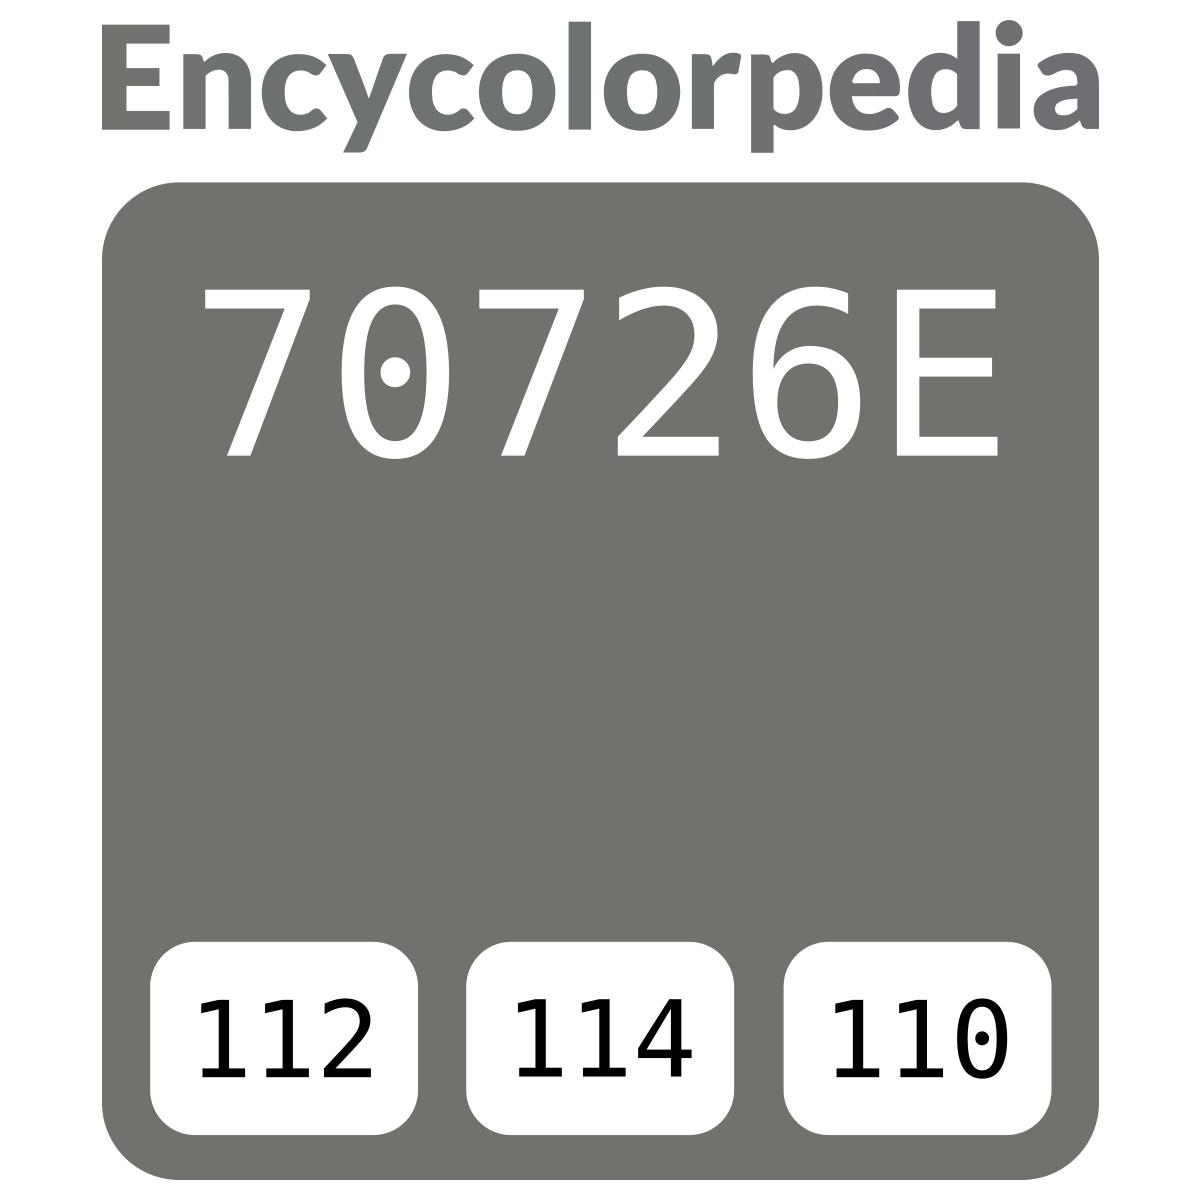 Teinte De Gris Clair afnor gris clair / 1680 / #70726e schémas de couleurs